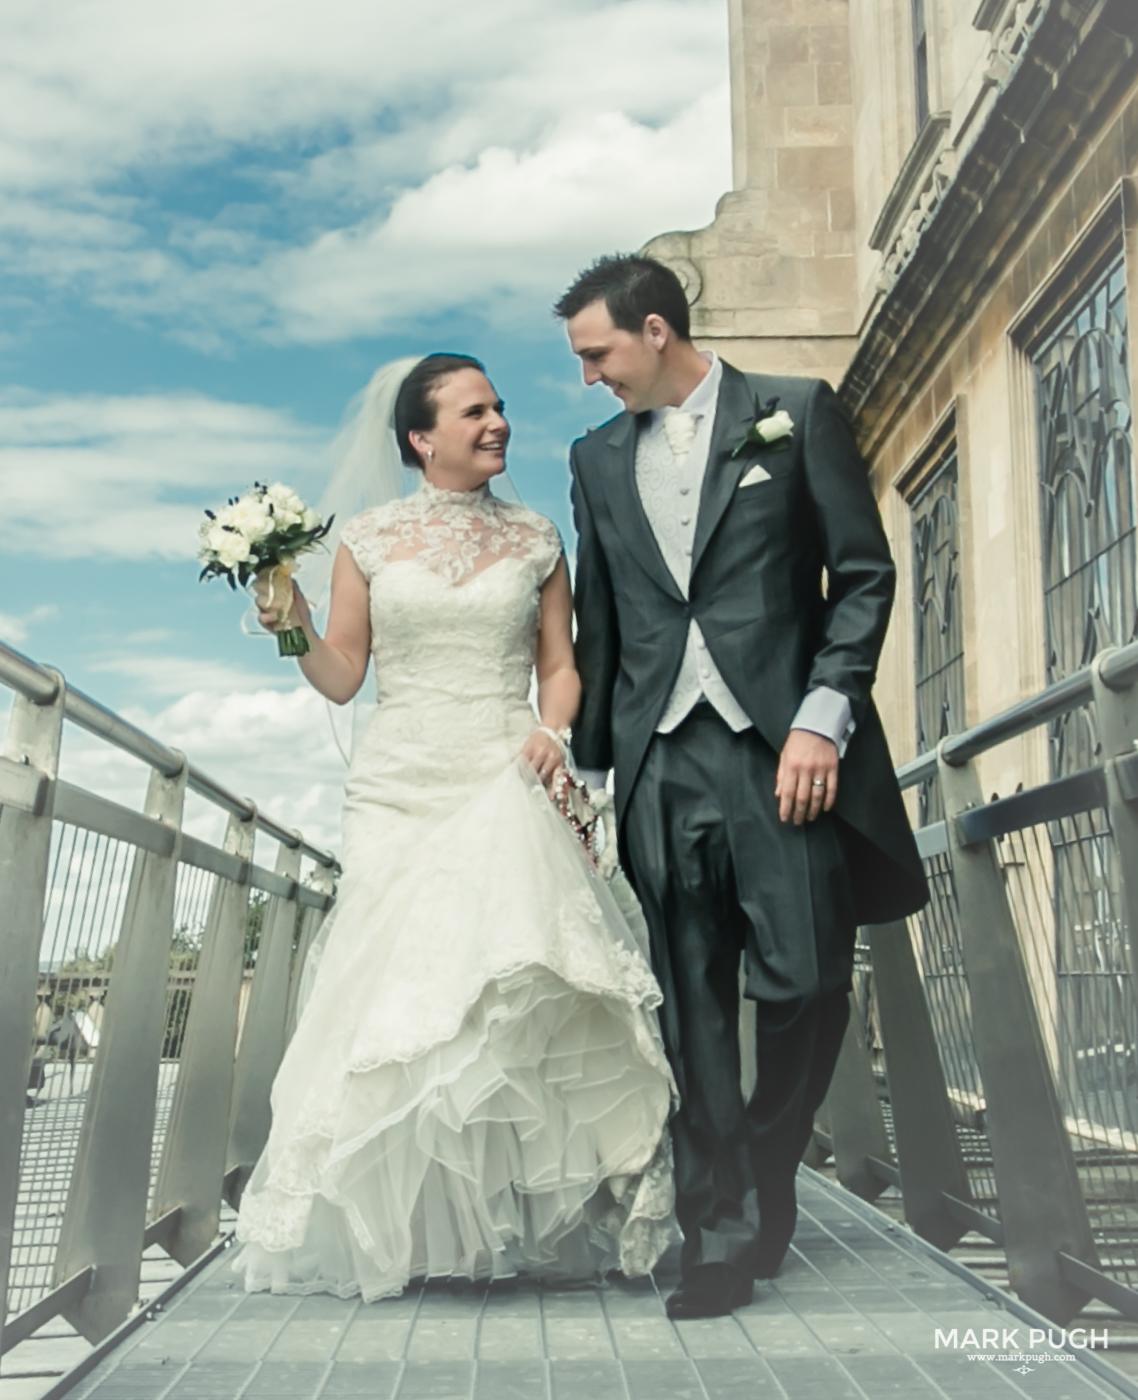 124- Laura and Peter - Wollaton Hall Wedding Nottingham UK by Mark Pugh www.markpugh.com.jpg